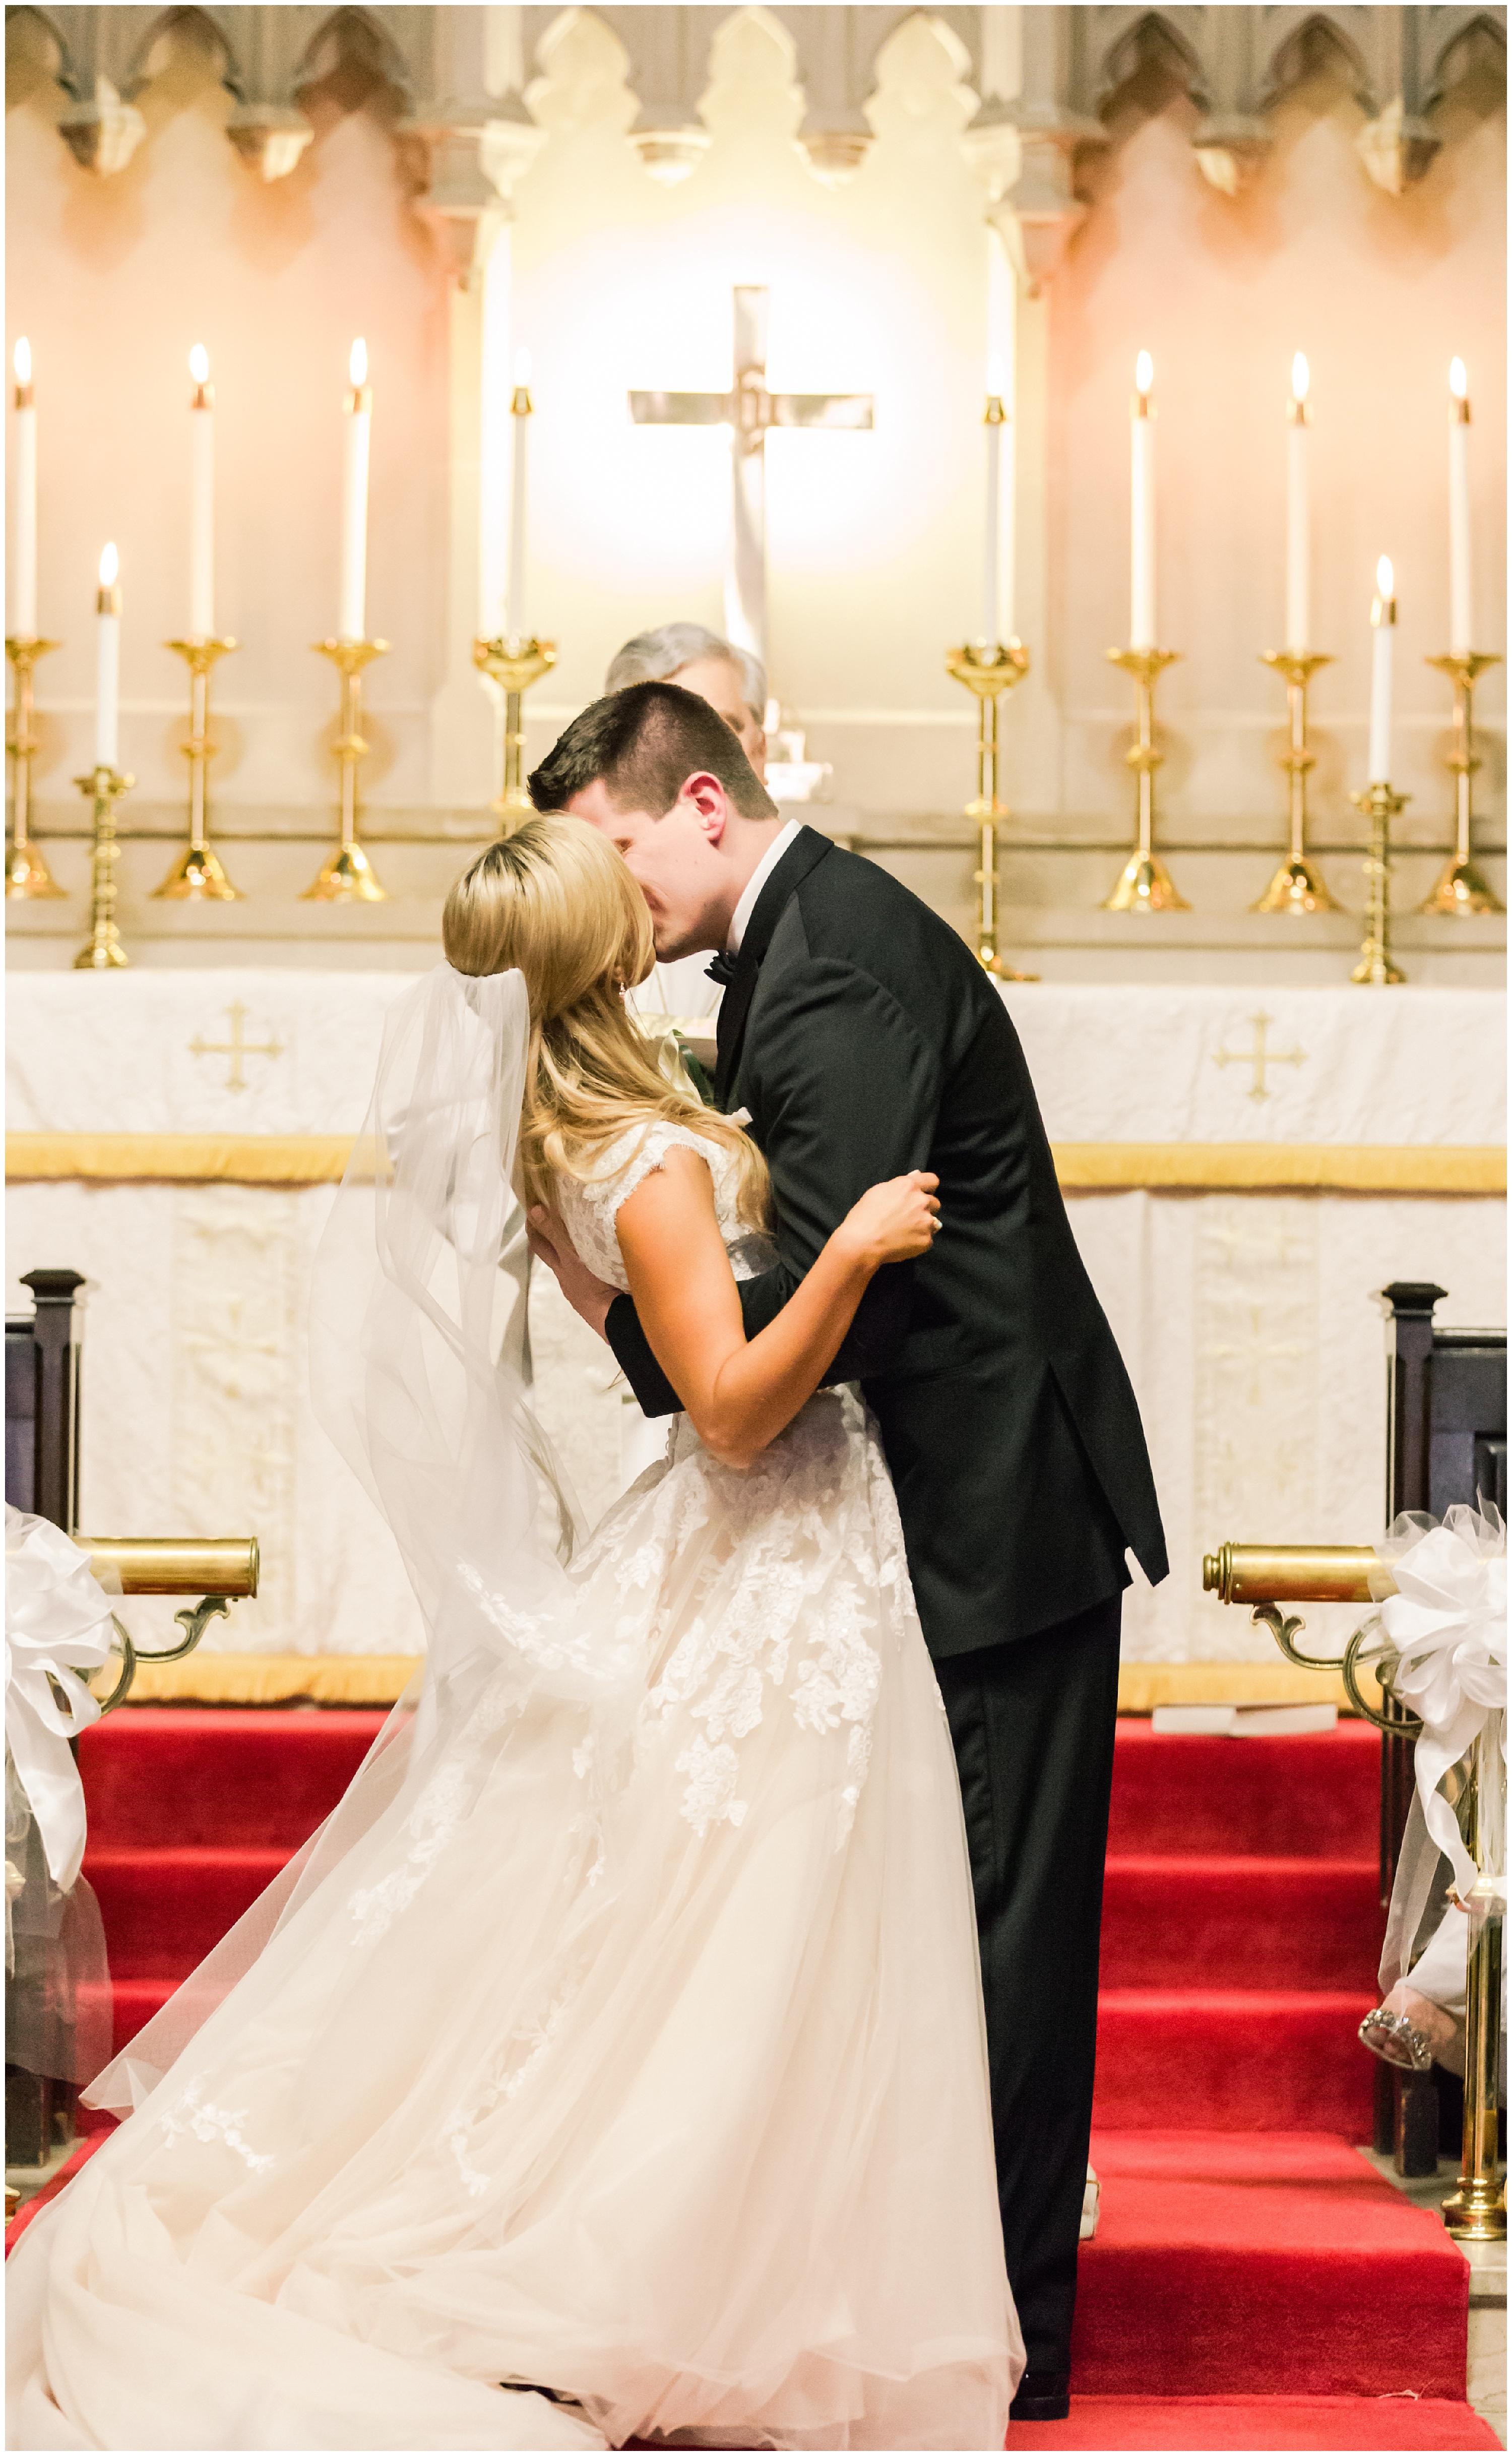 Cate-Steven-Hay-Adams-All-Saints-DC-Wedding00035